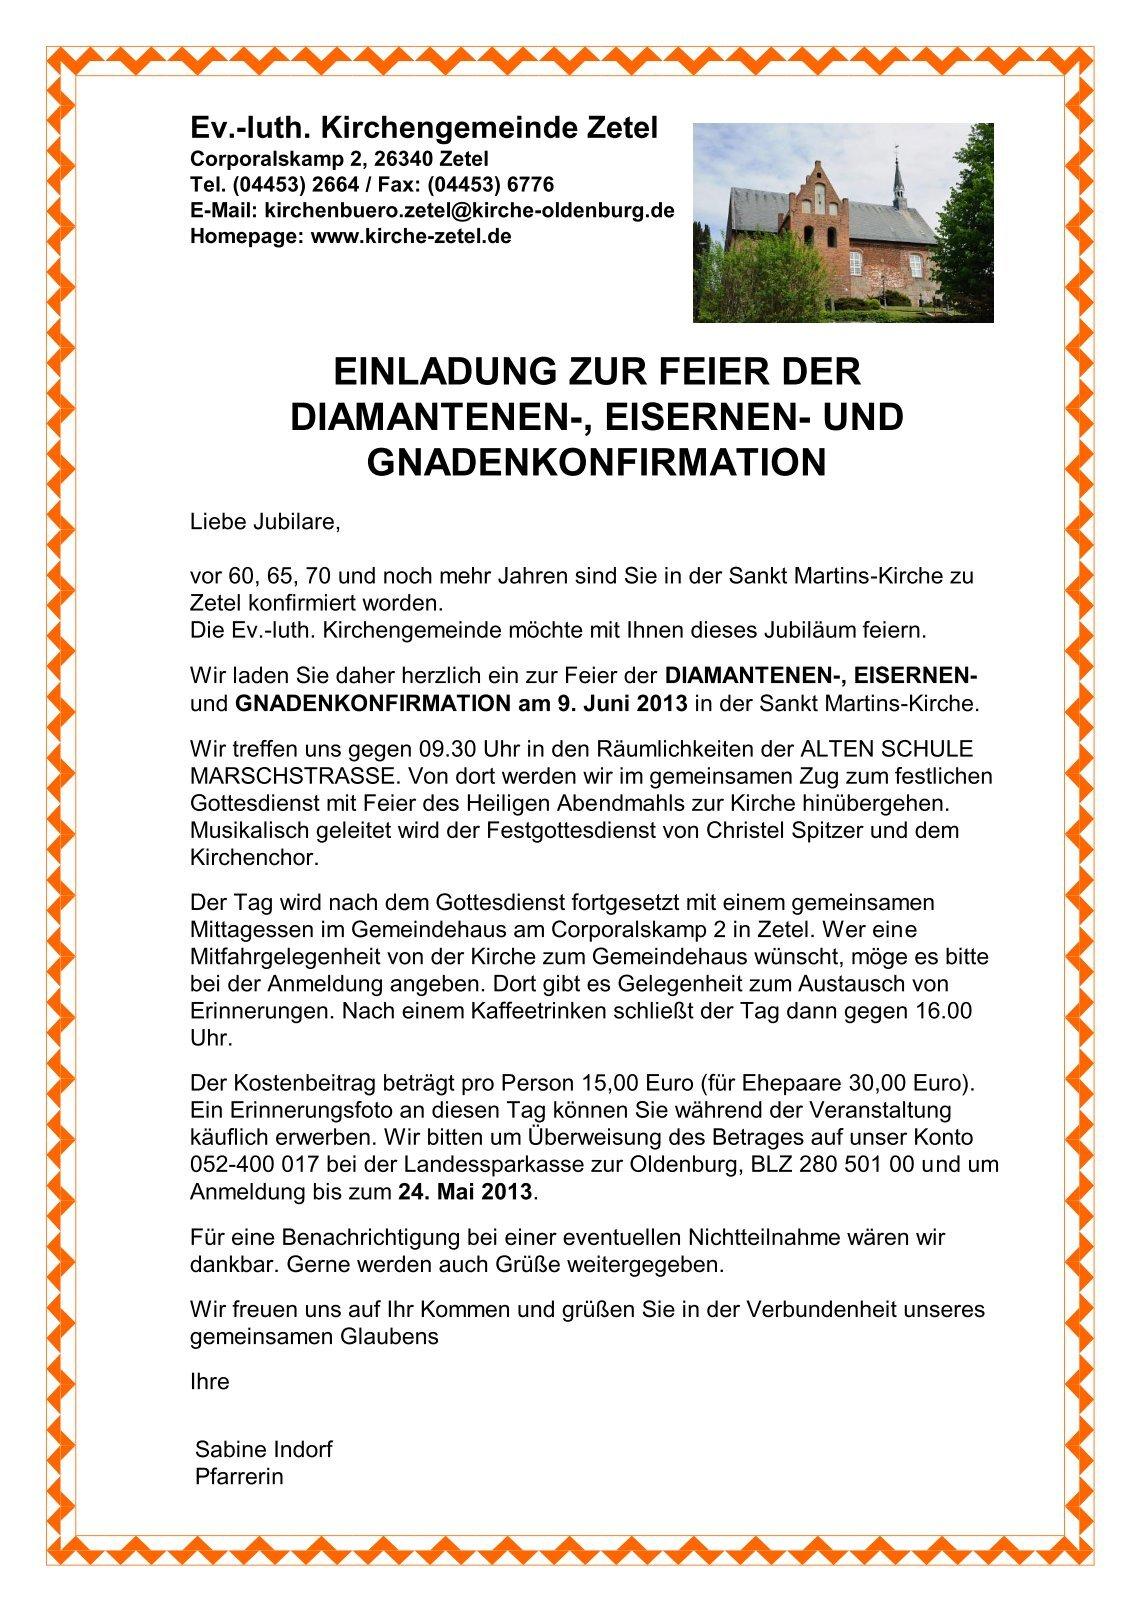 5 free magazines from kirche.friesischewehde.de, Einladung